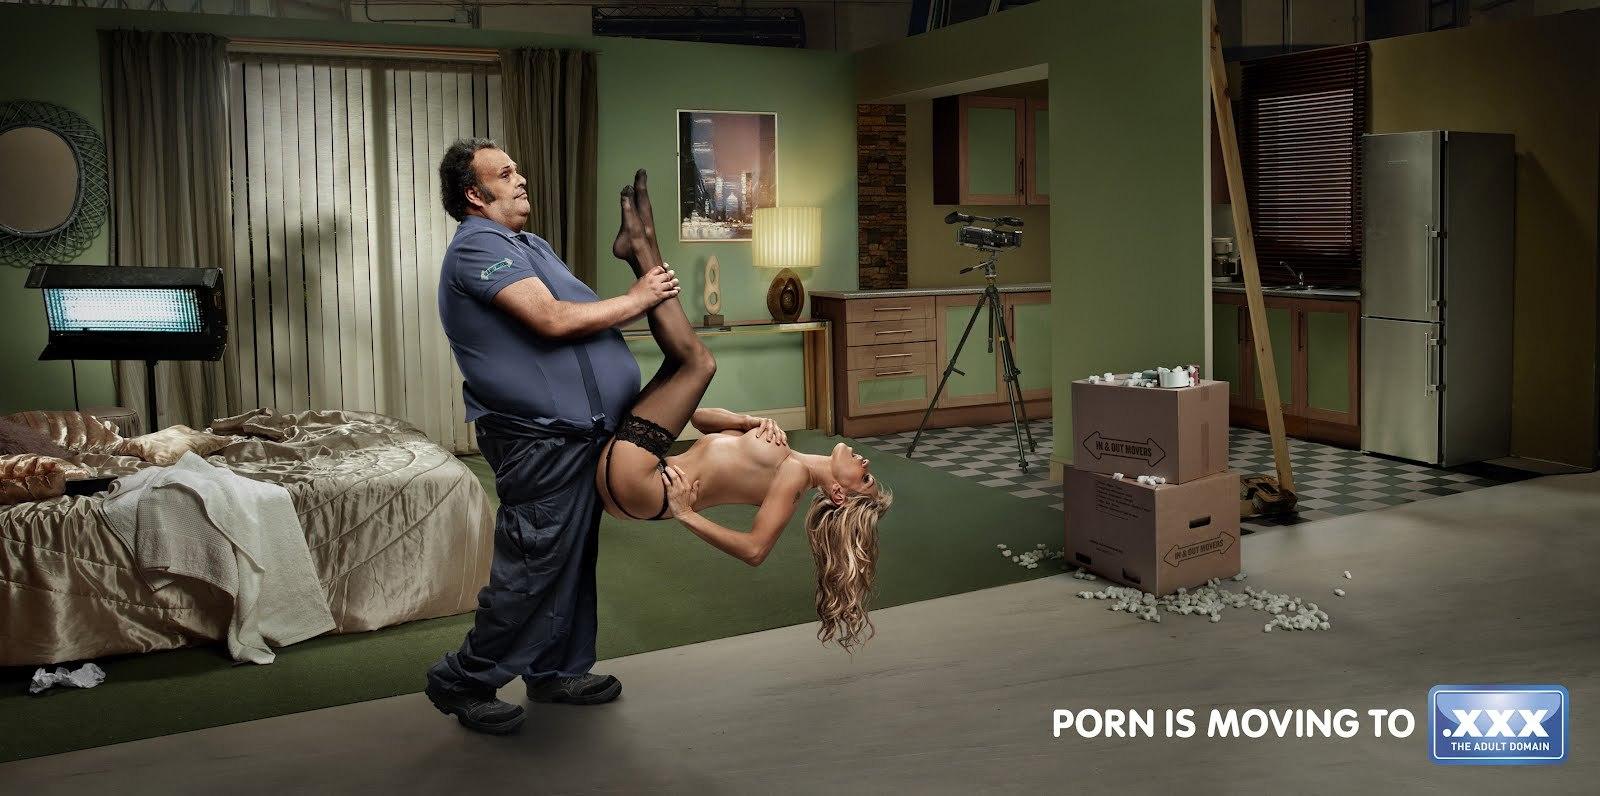 smeshnoe-porno-reklama-foto-tolstie-babi-v-trusah